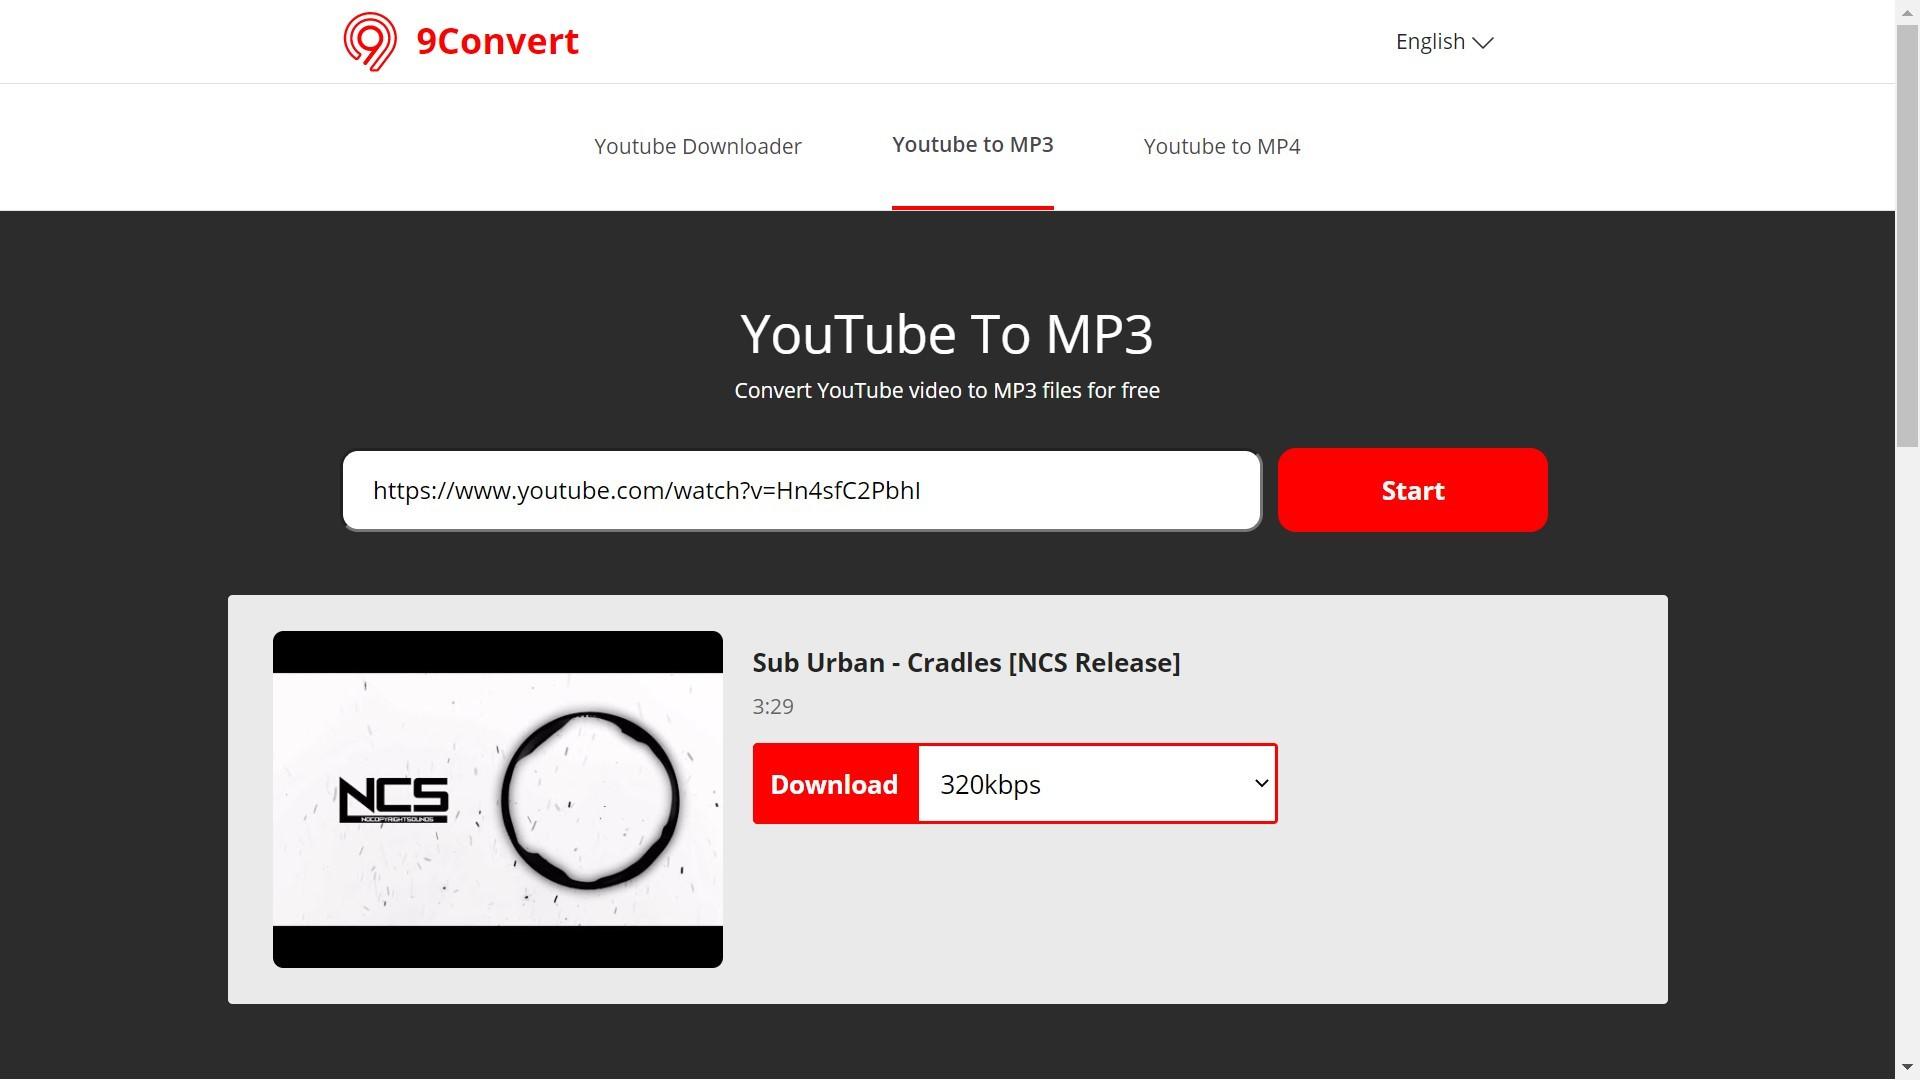 convertitore da youtube a mp3